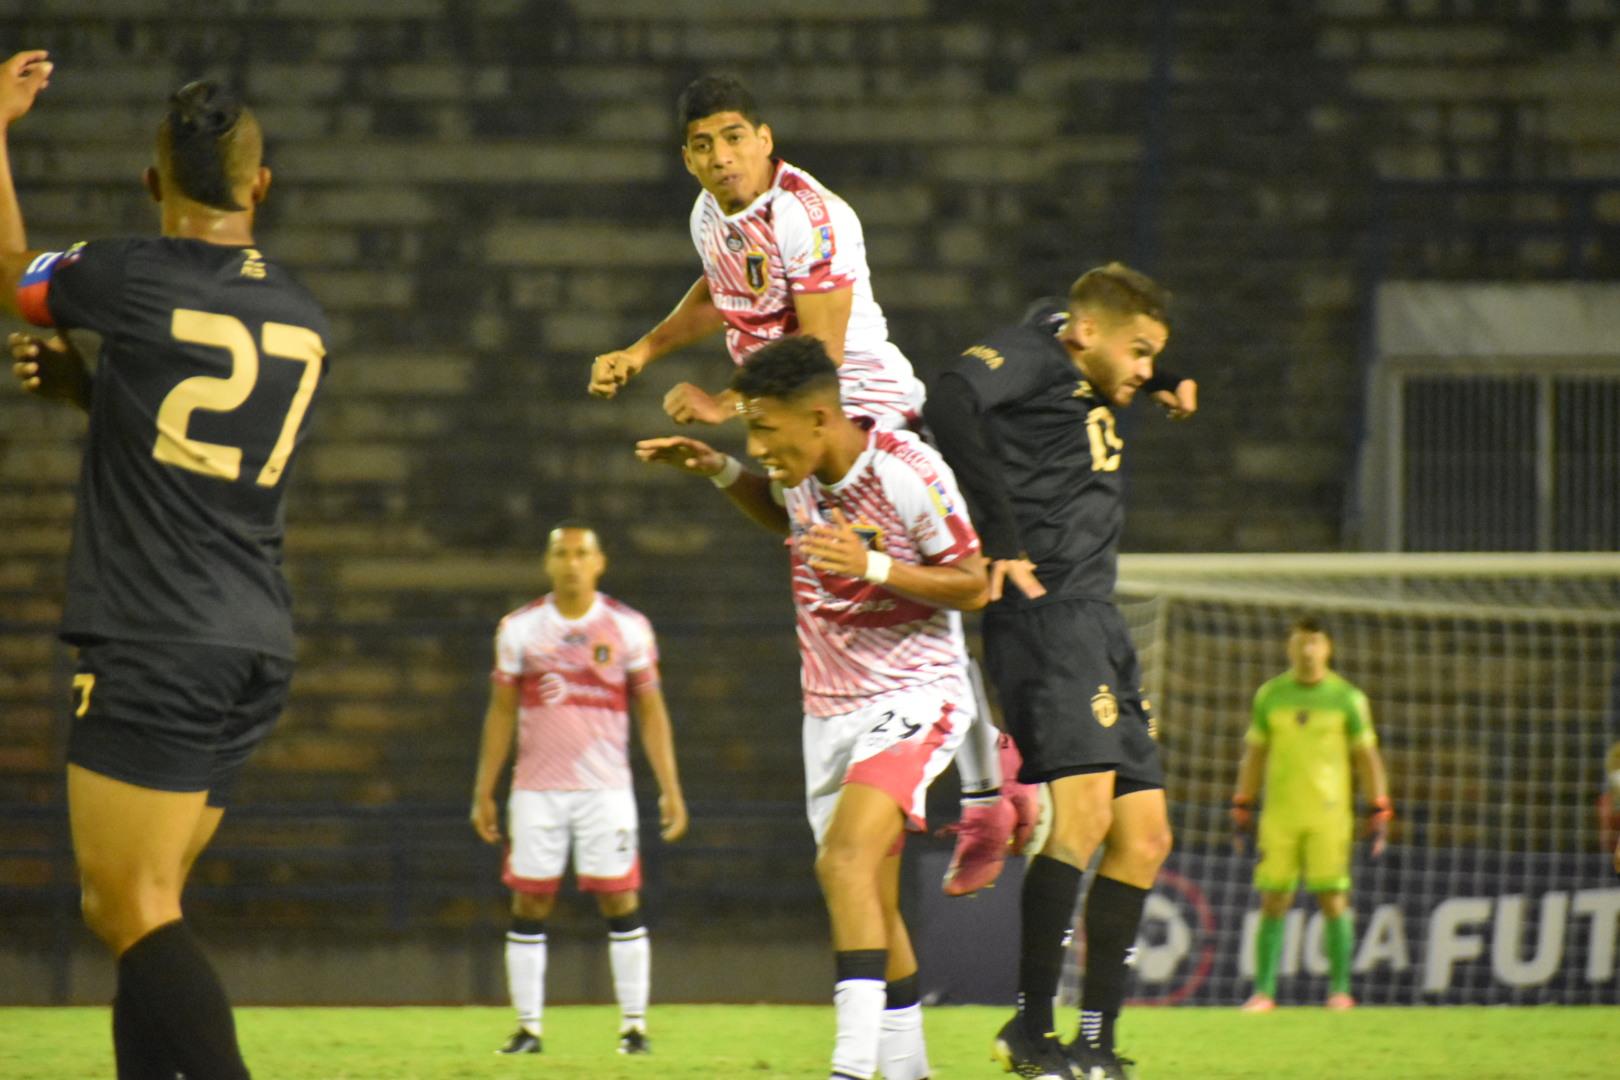 Lala FC vs Monagas SC